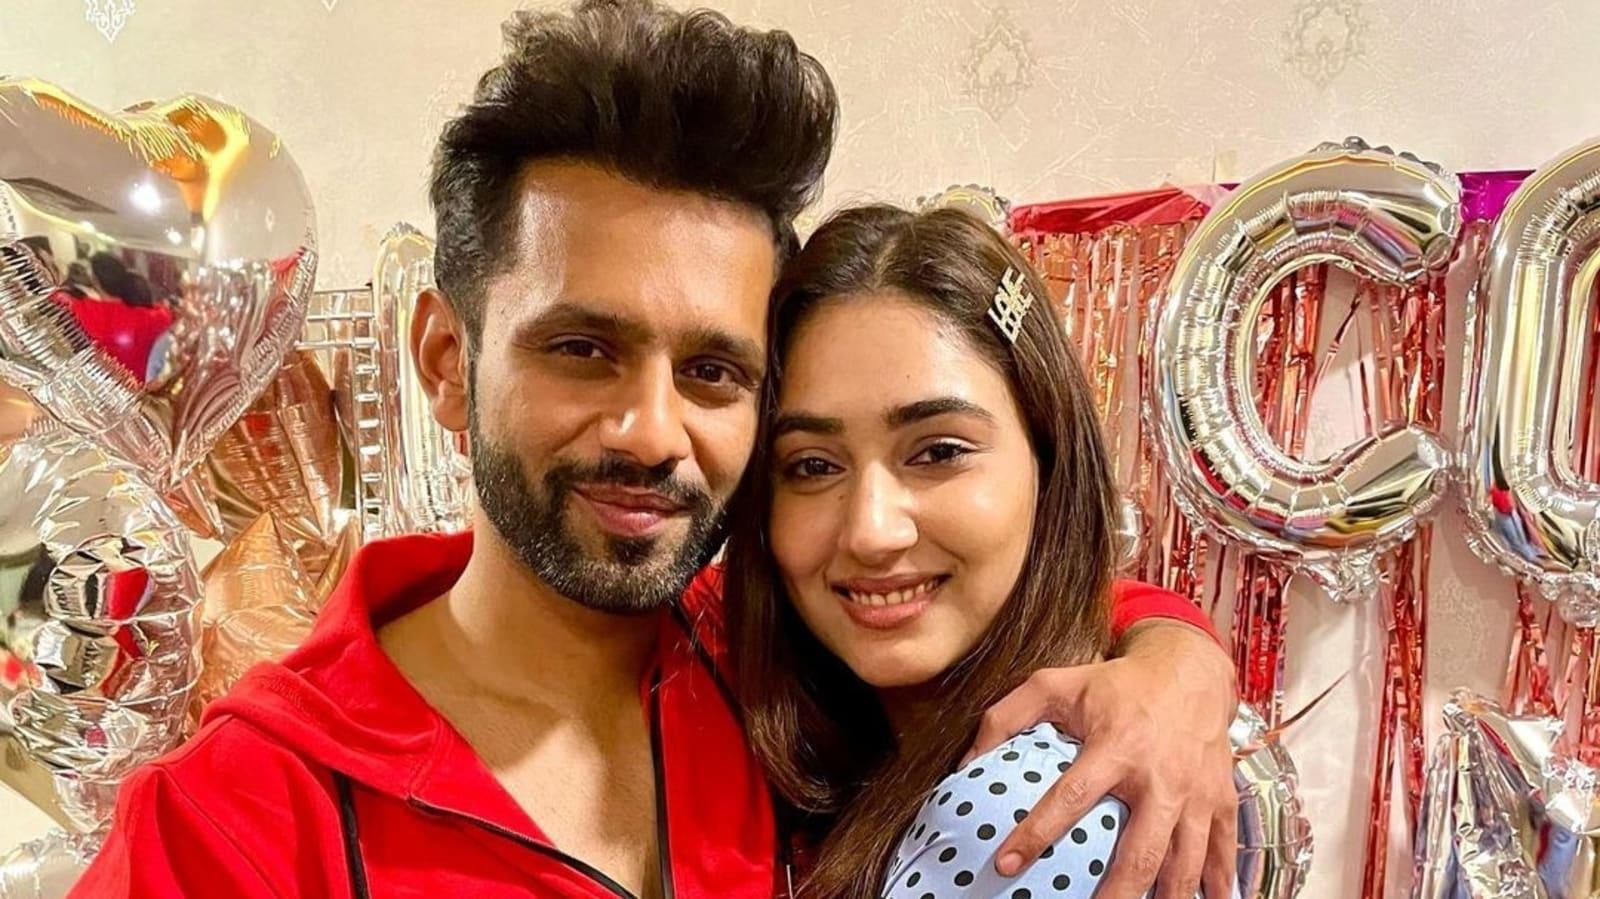 Rahul Vaidya gives a peek into late-night video call with girlfriend Disha Parmar - Hindustan Times